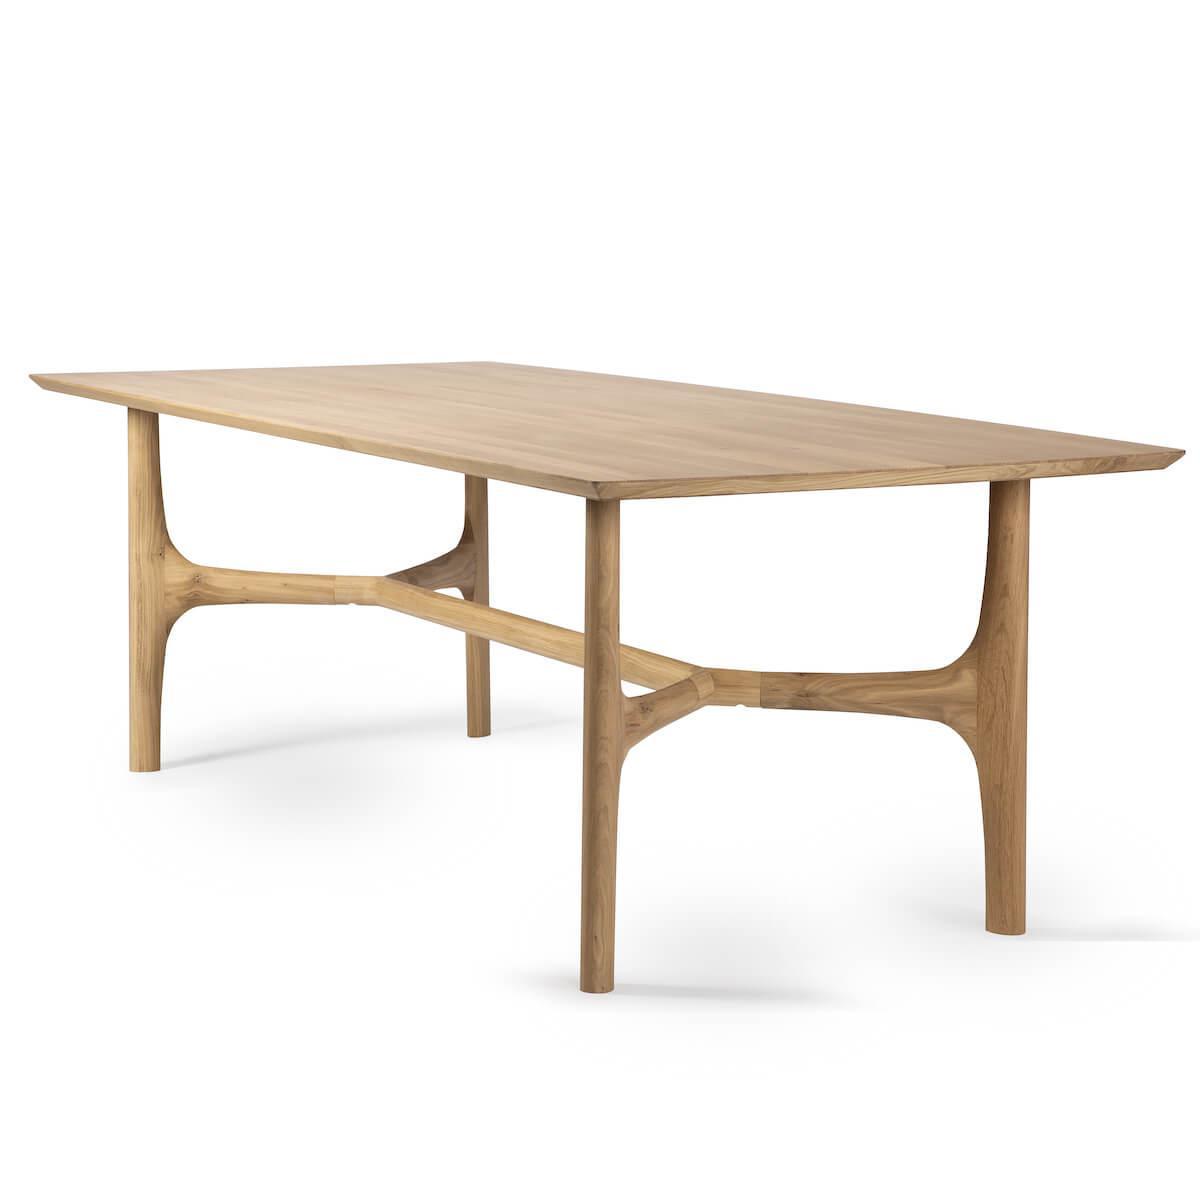 Table 100x210cm NEXUS Ethnicraft chêne